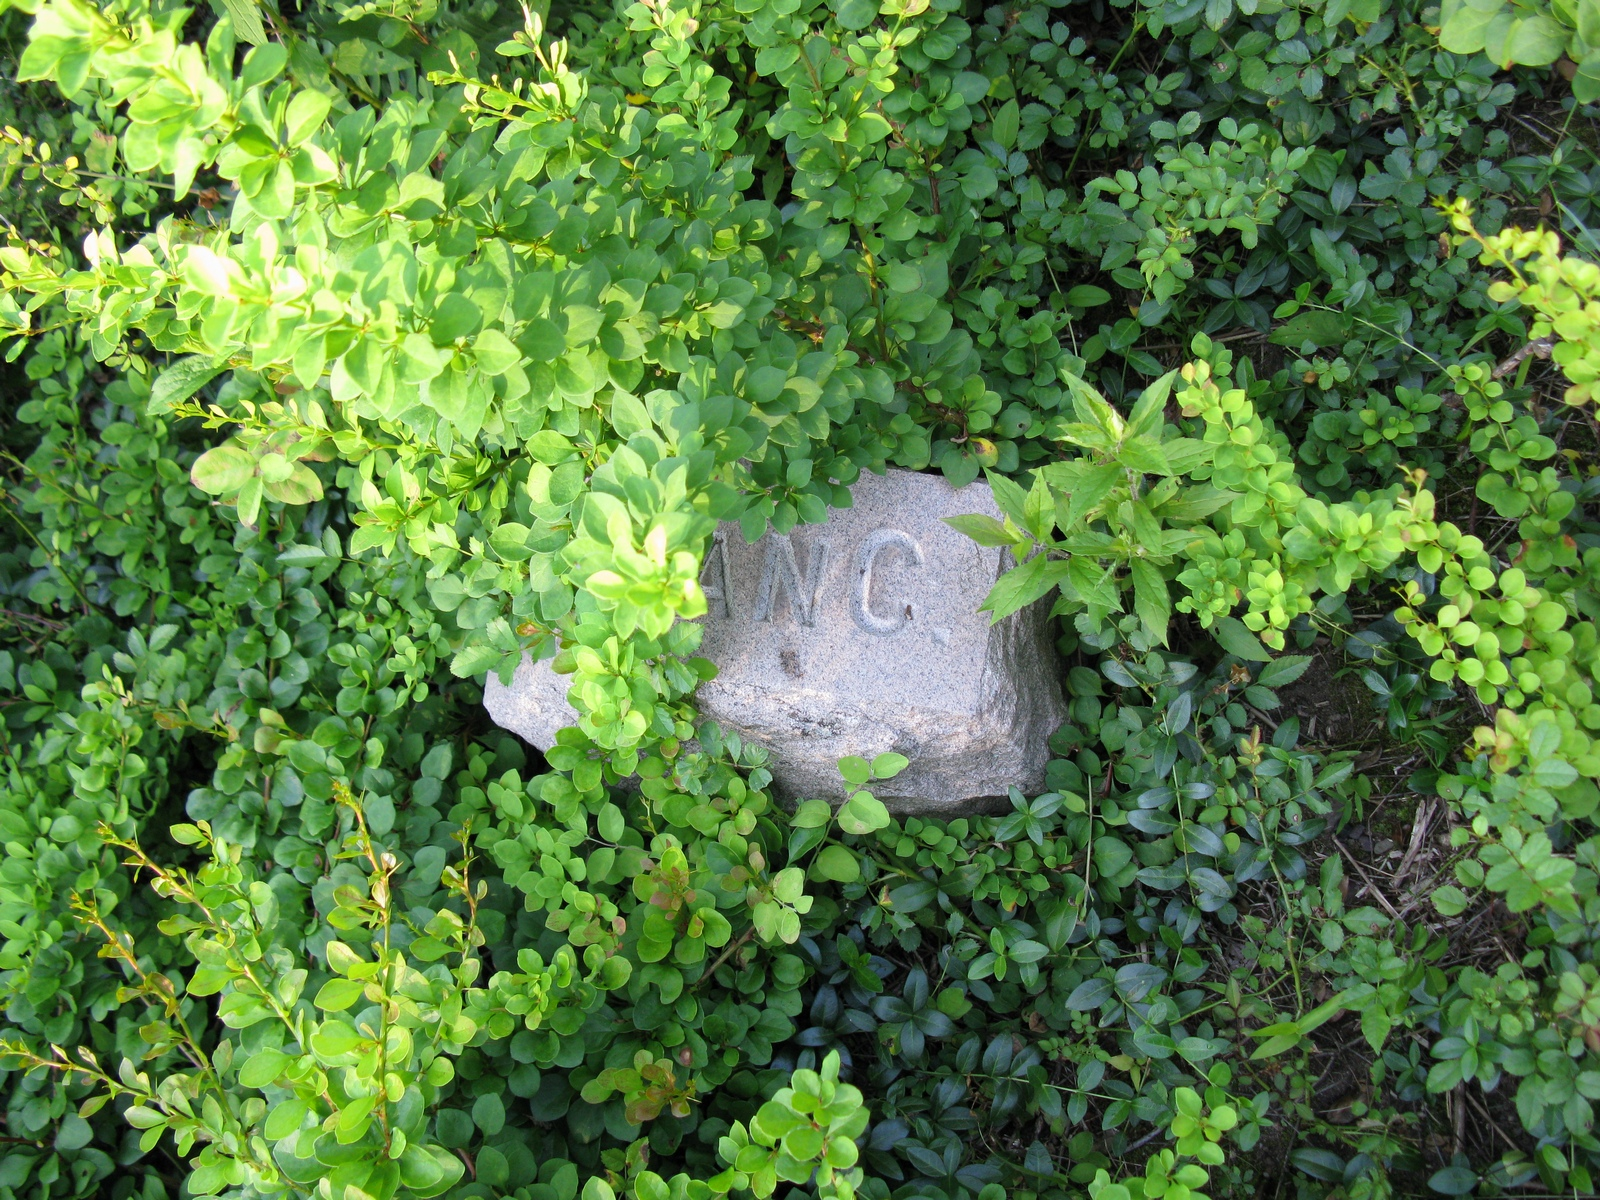 Vancampen child's grave